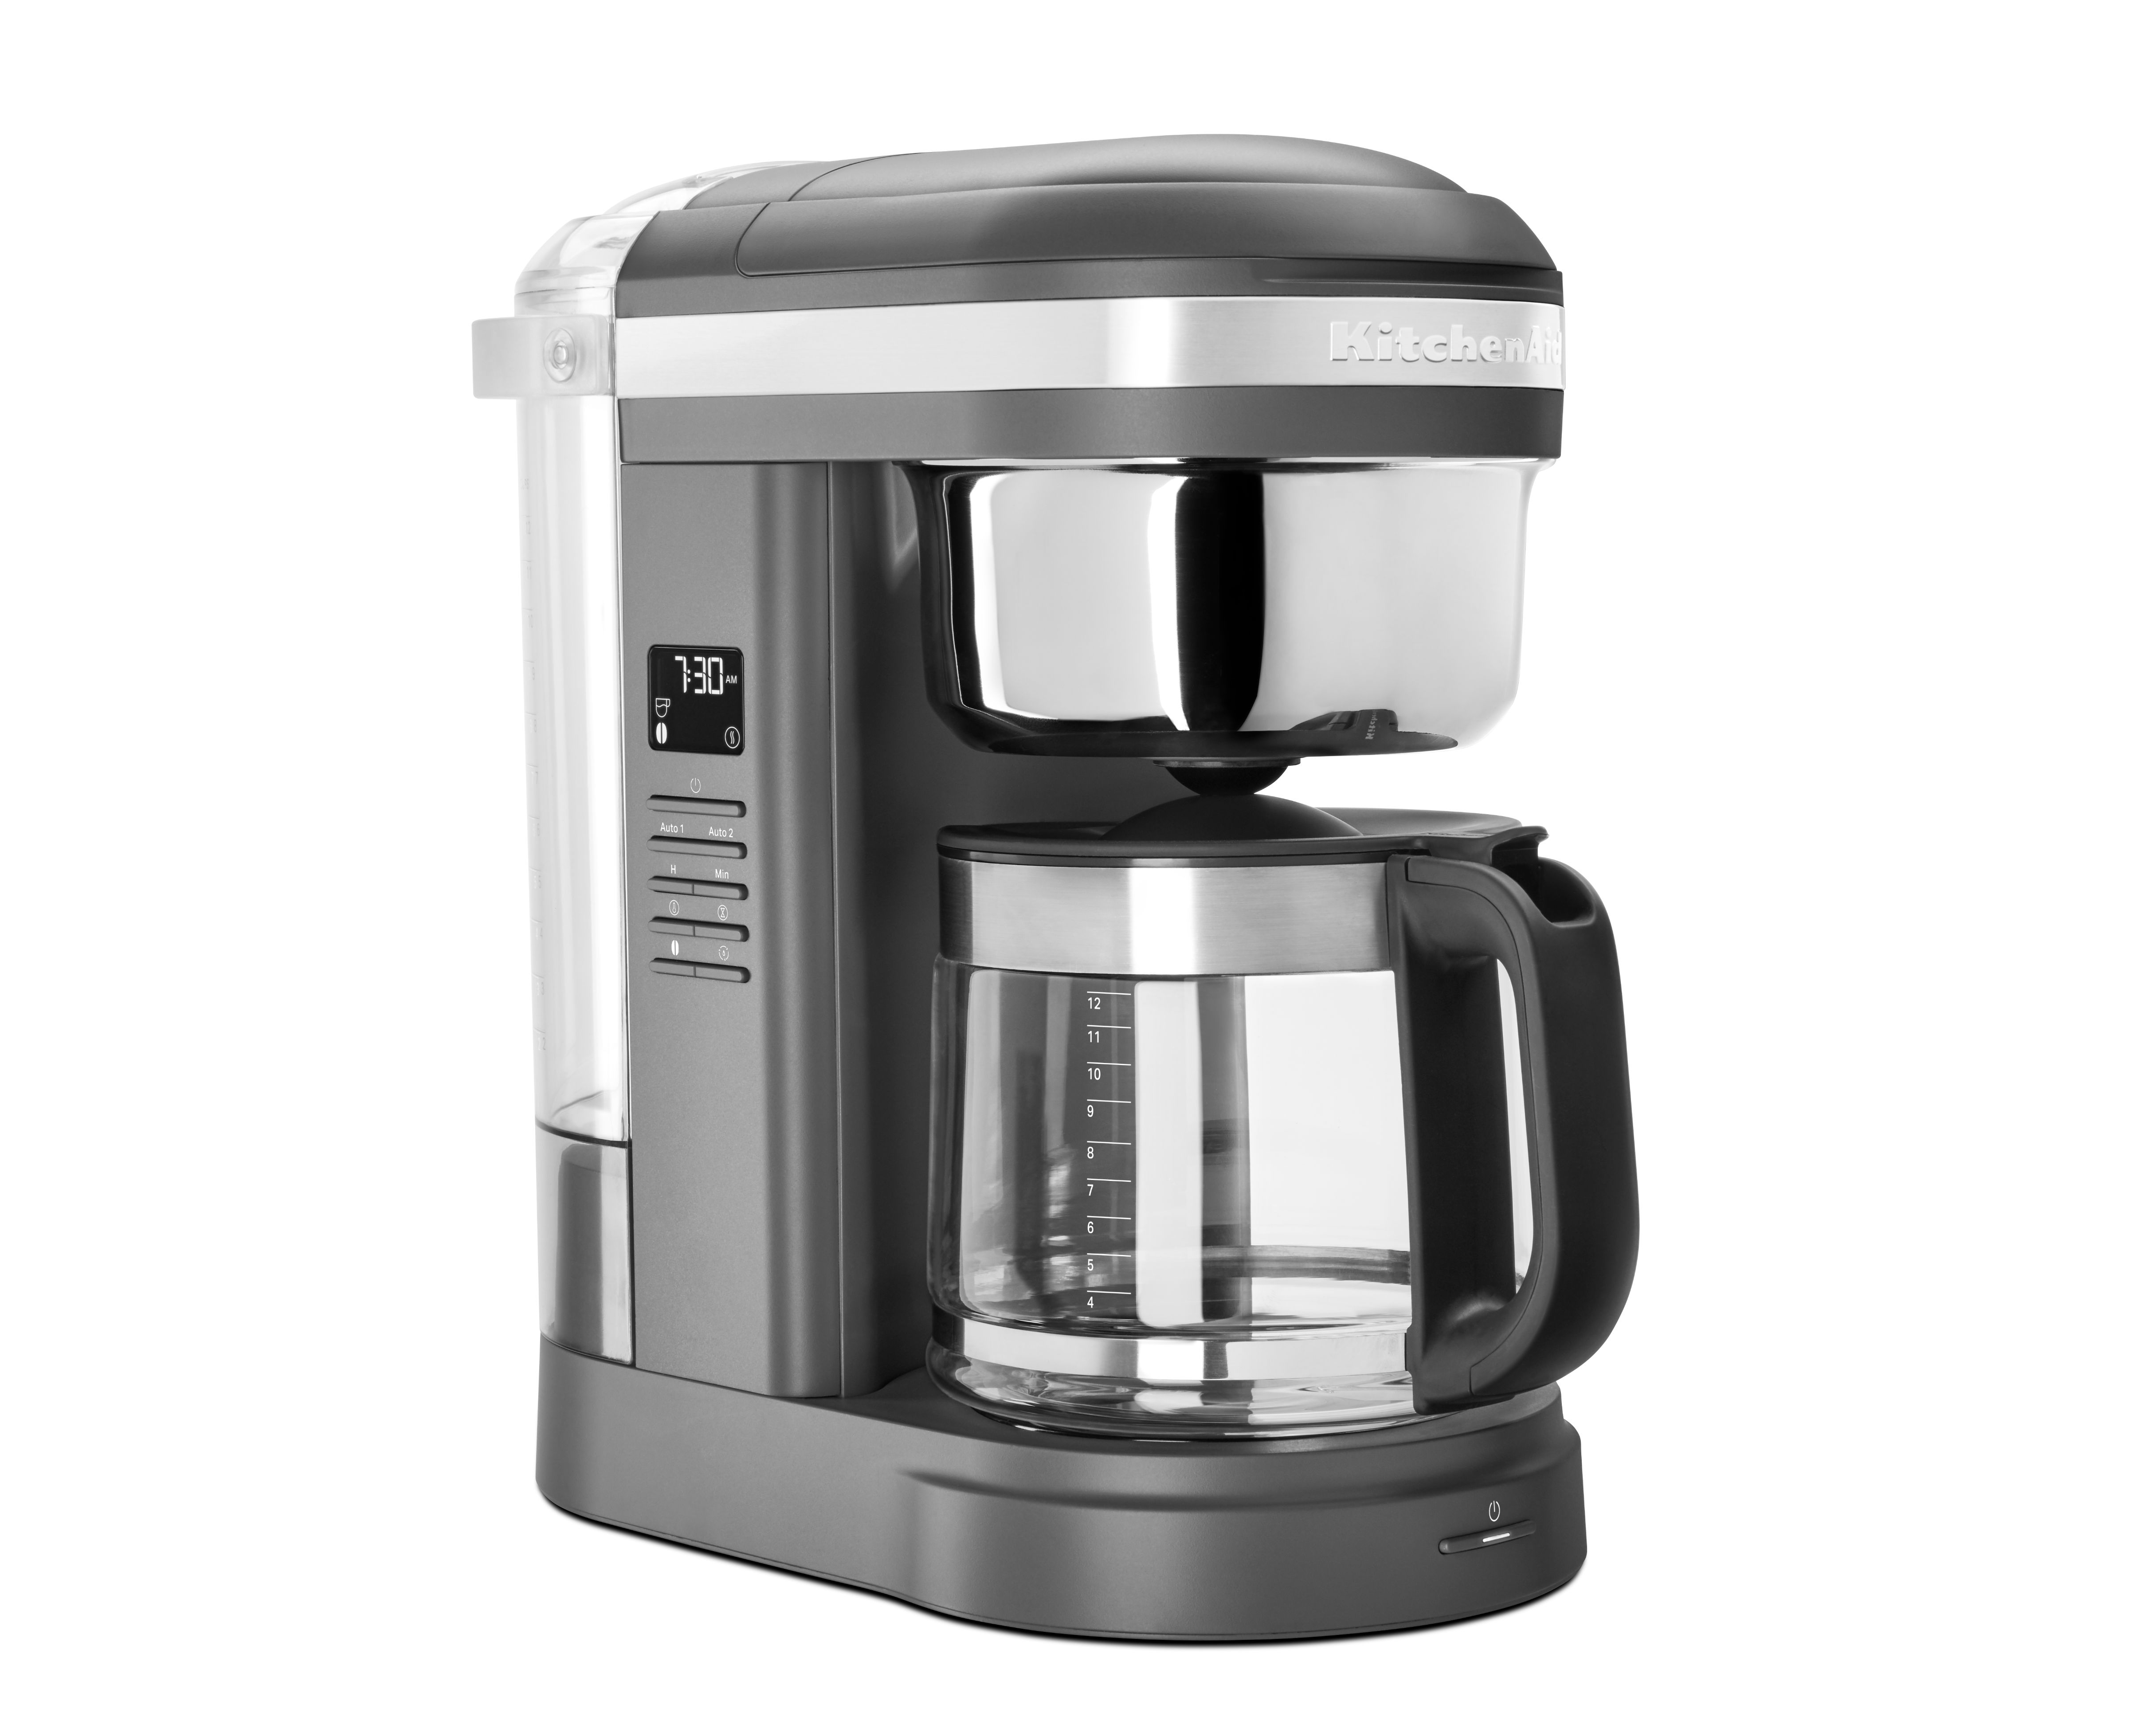 KichenAid Drip kaffemaskine, matt grey